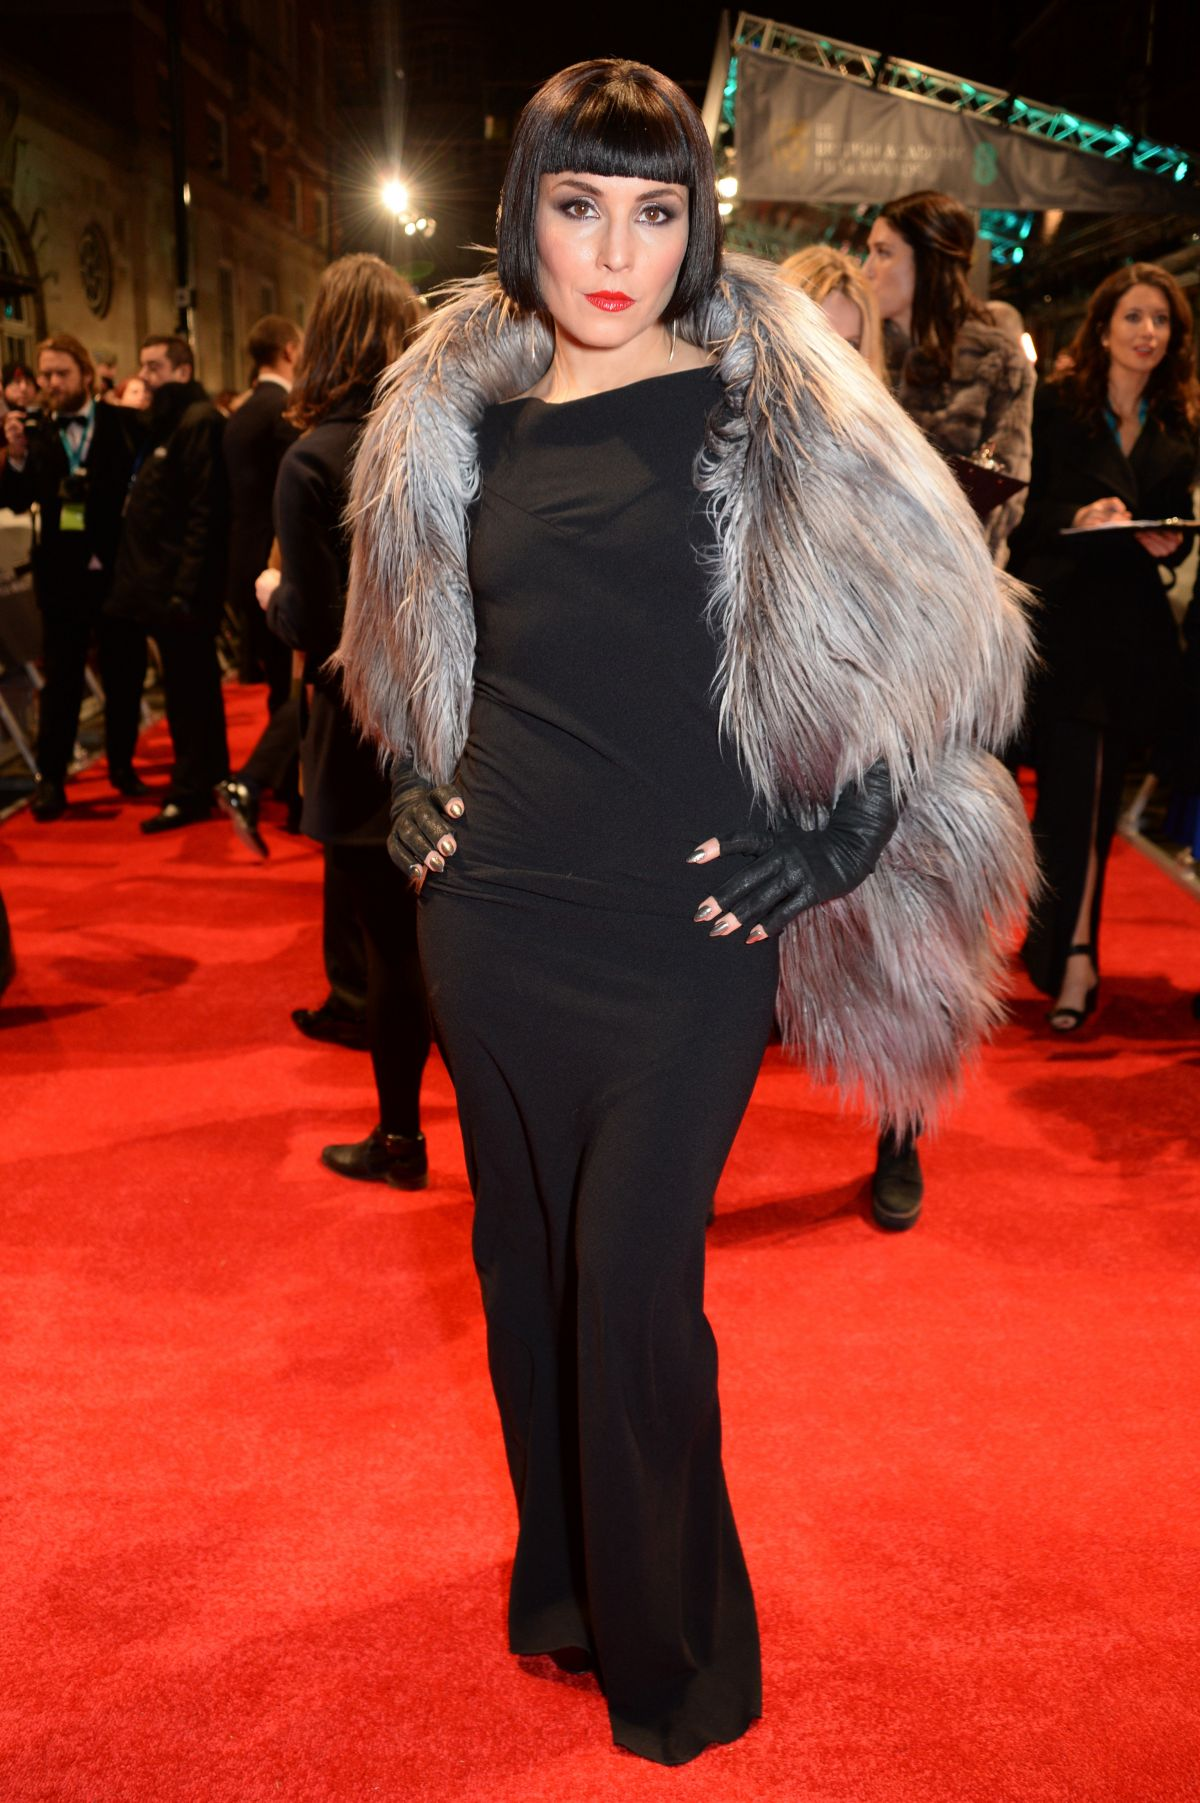 Noomi Rapace At Bafta 2017 Awards In London 02 12 2017